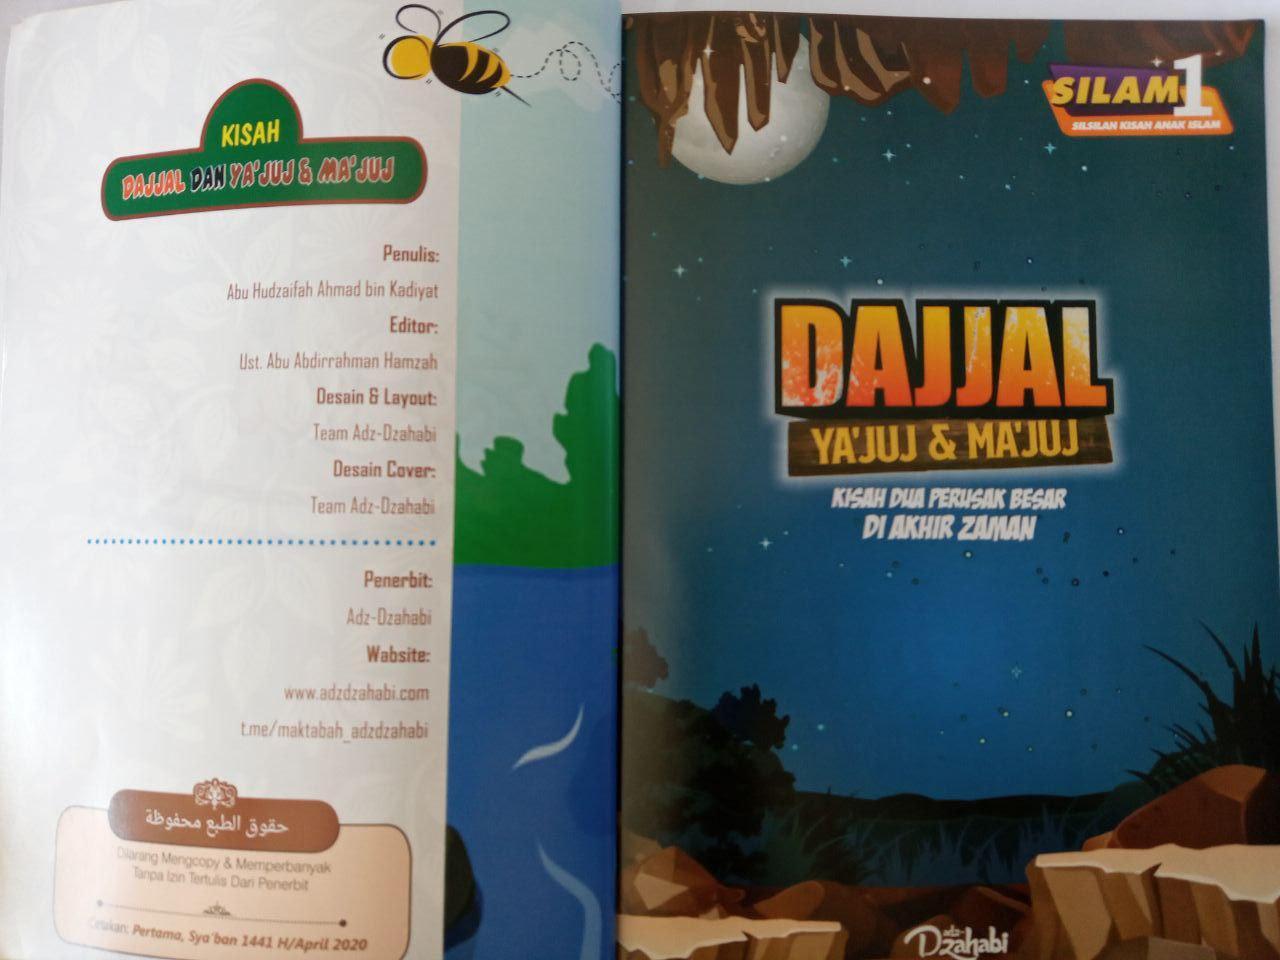 Buku Anak : Dajjal, Yajuj dan Majuj Kisah Dua Perusak di Akhir Zaman Adz Dzahabi